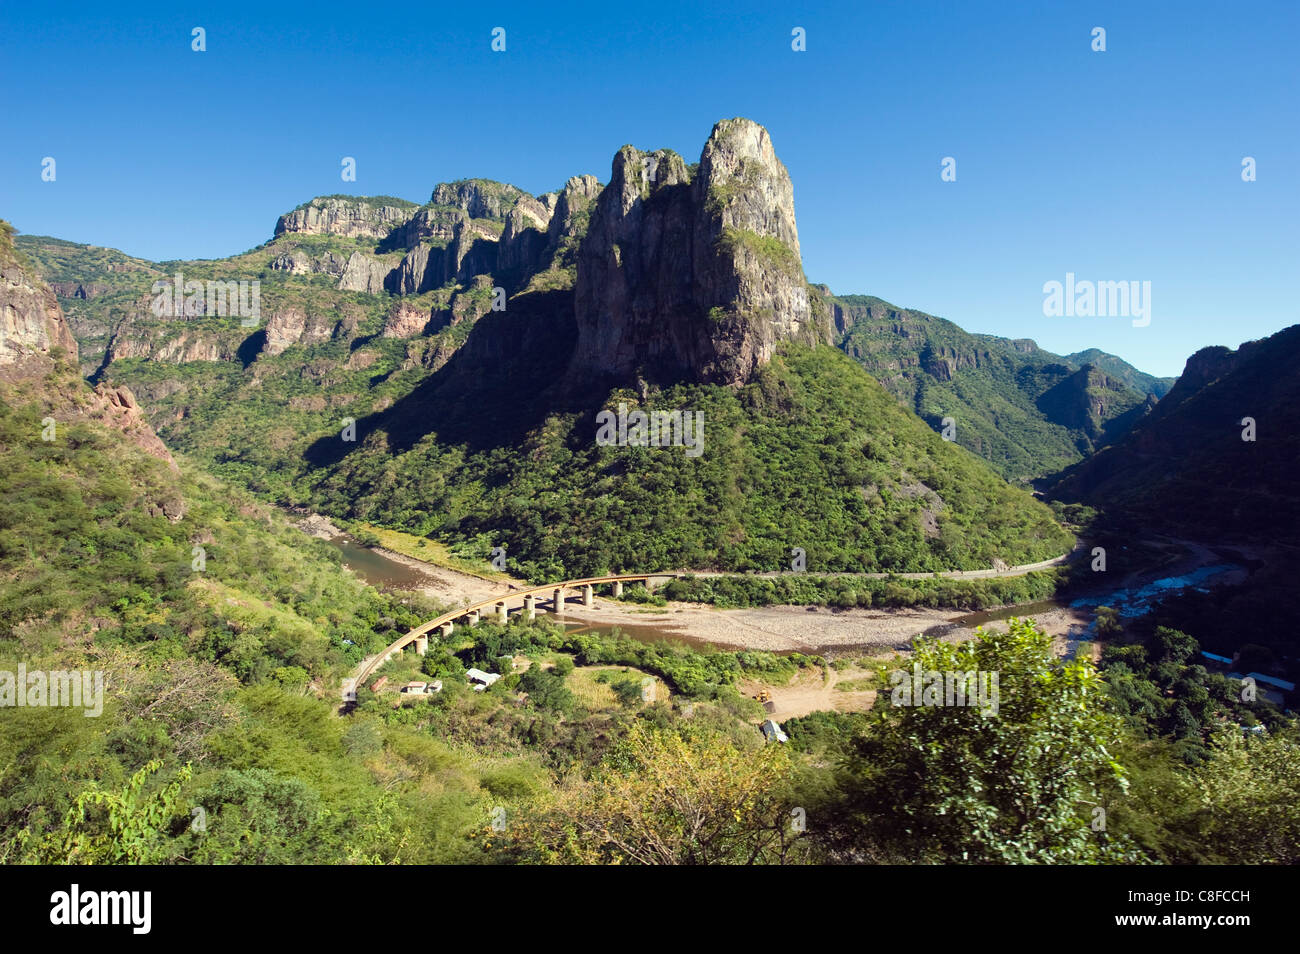 El Chepe Bahnreise durch Barranca del Cobre (Copper Canyon, Staat Chihuahua, Mexiko Stockbild